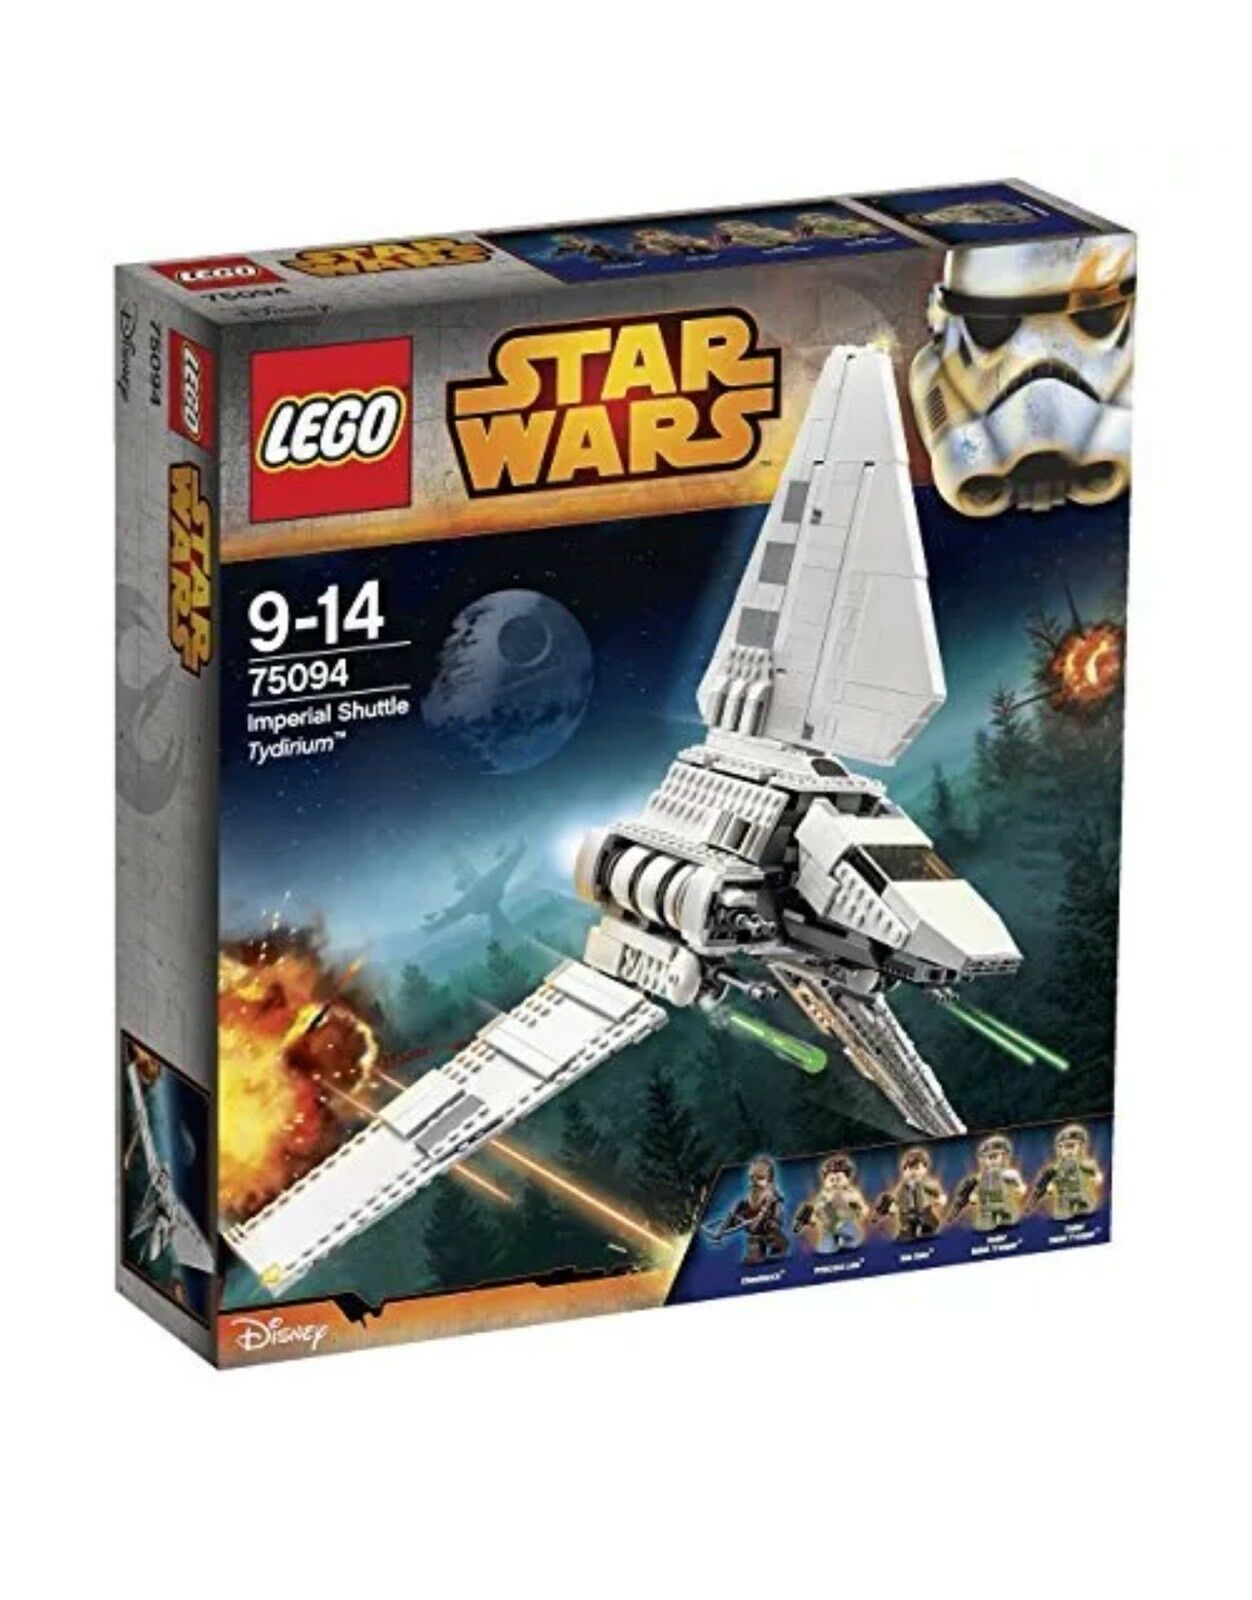 LEGO Star Wars 75094 Imperial Shuttle Tydirium New Sealed Retired Retired Retired 87ac48